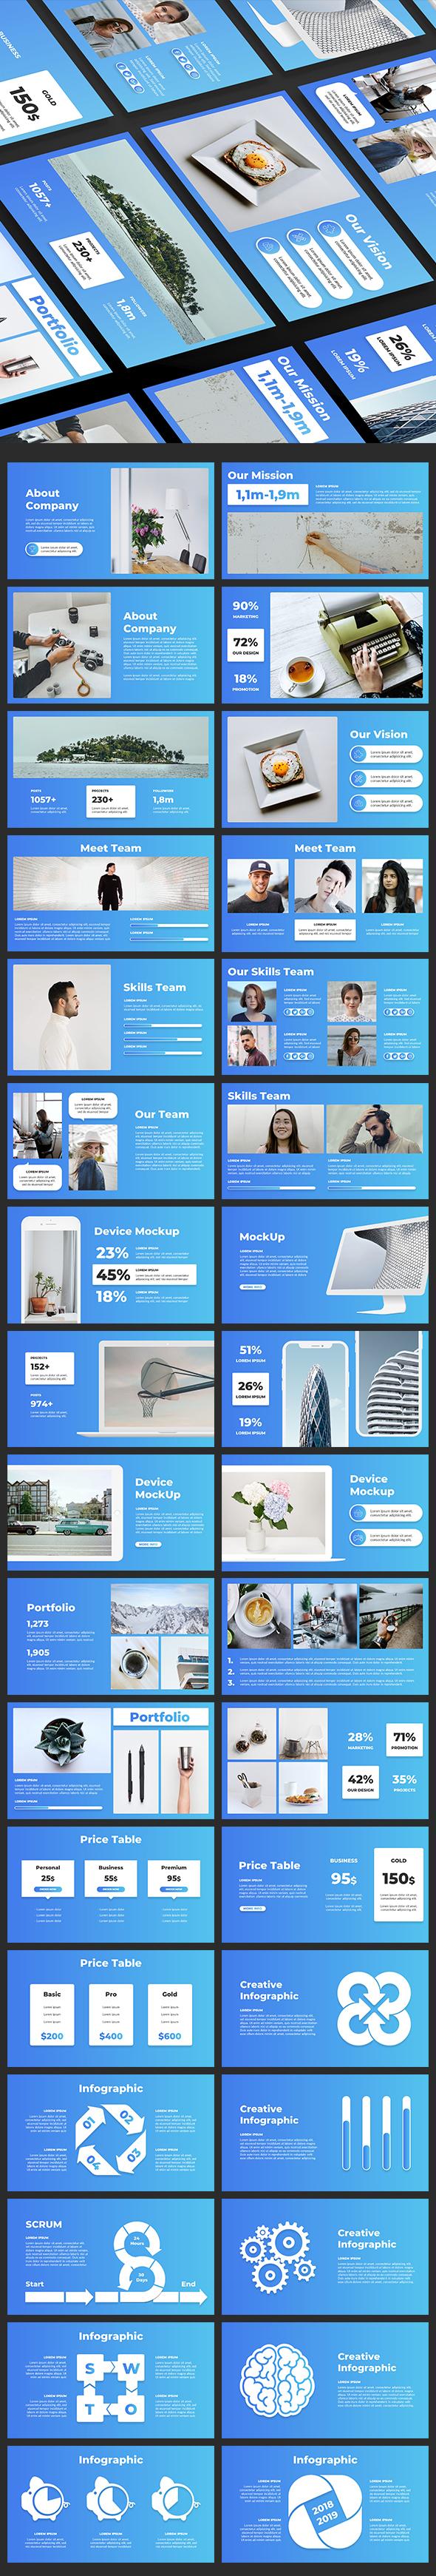 Pitch Deck Powerpoint Presentation - Business PowerPoint Templates